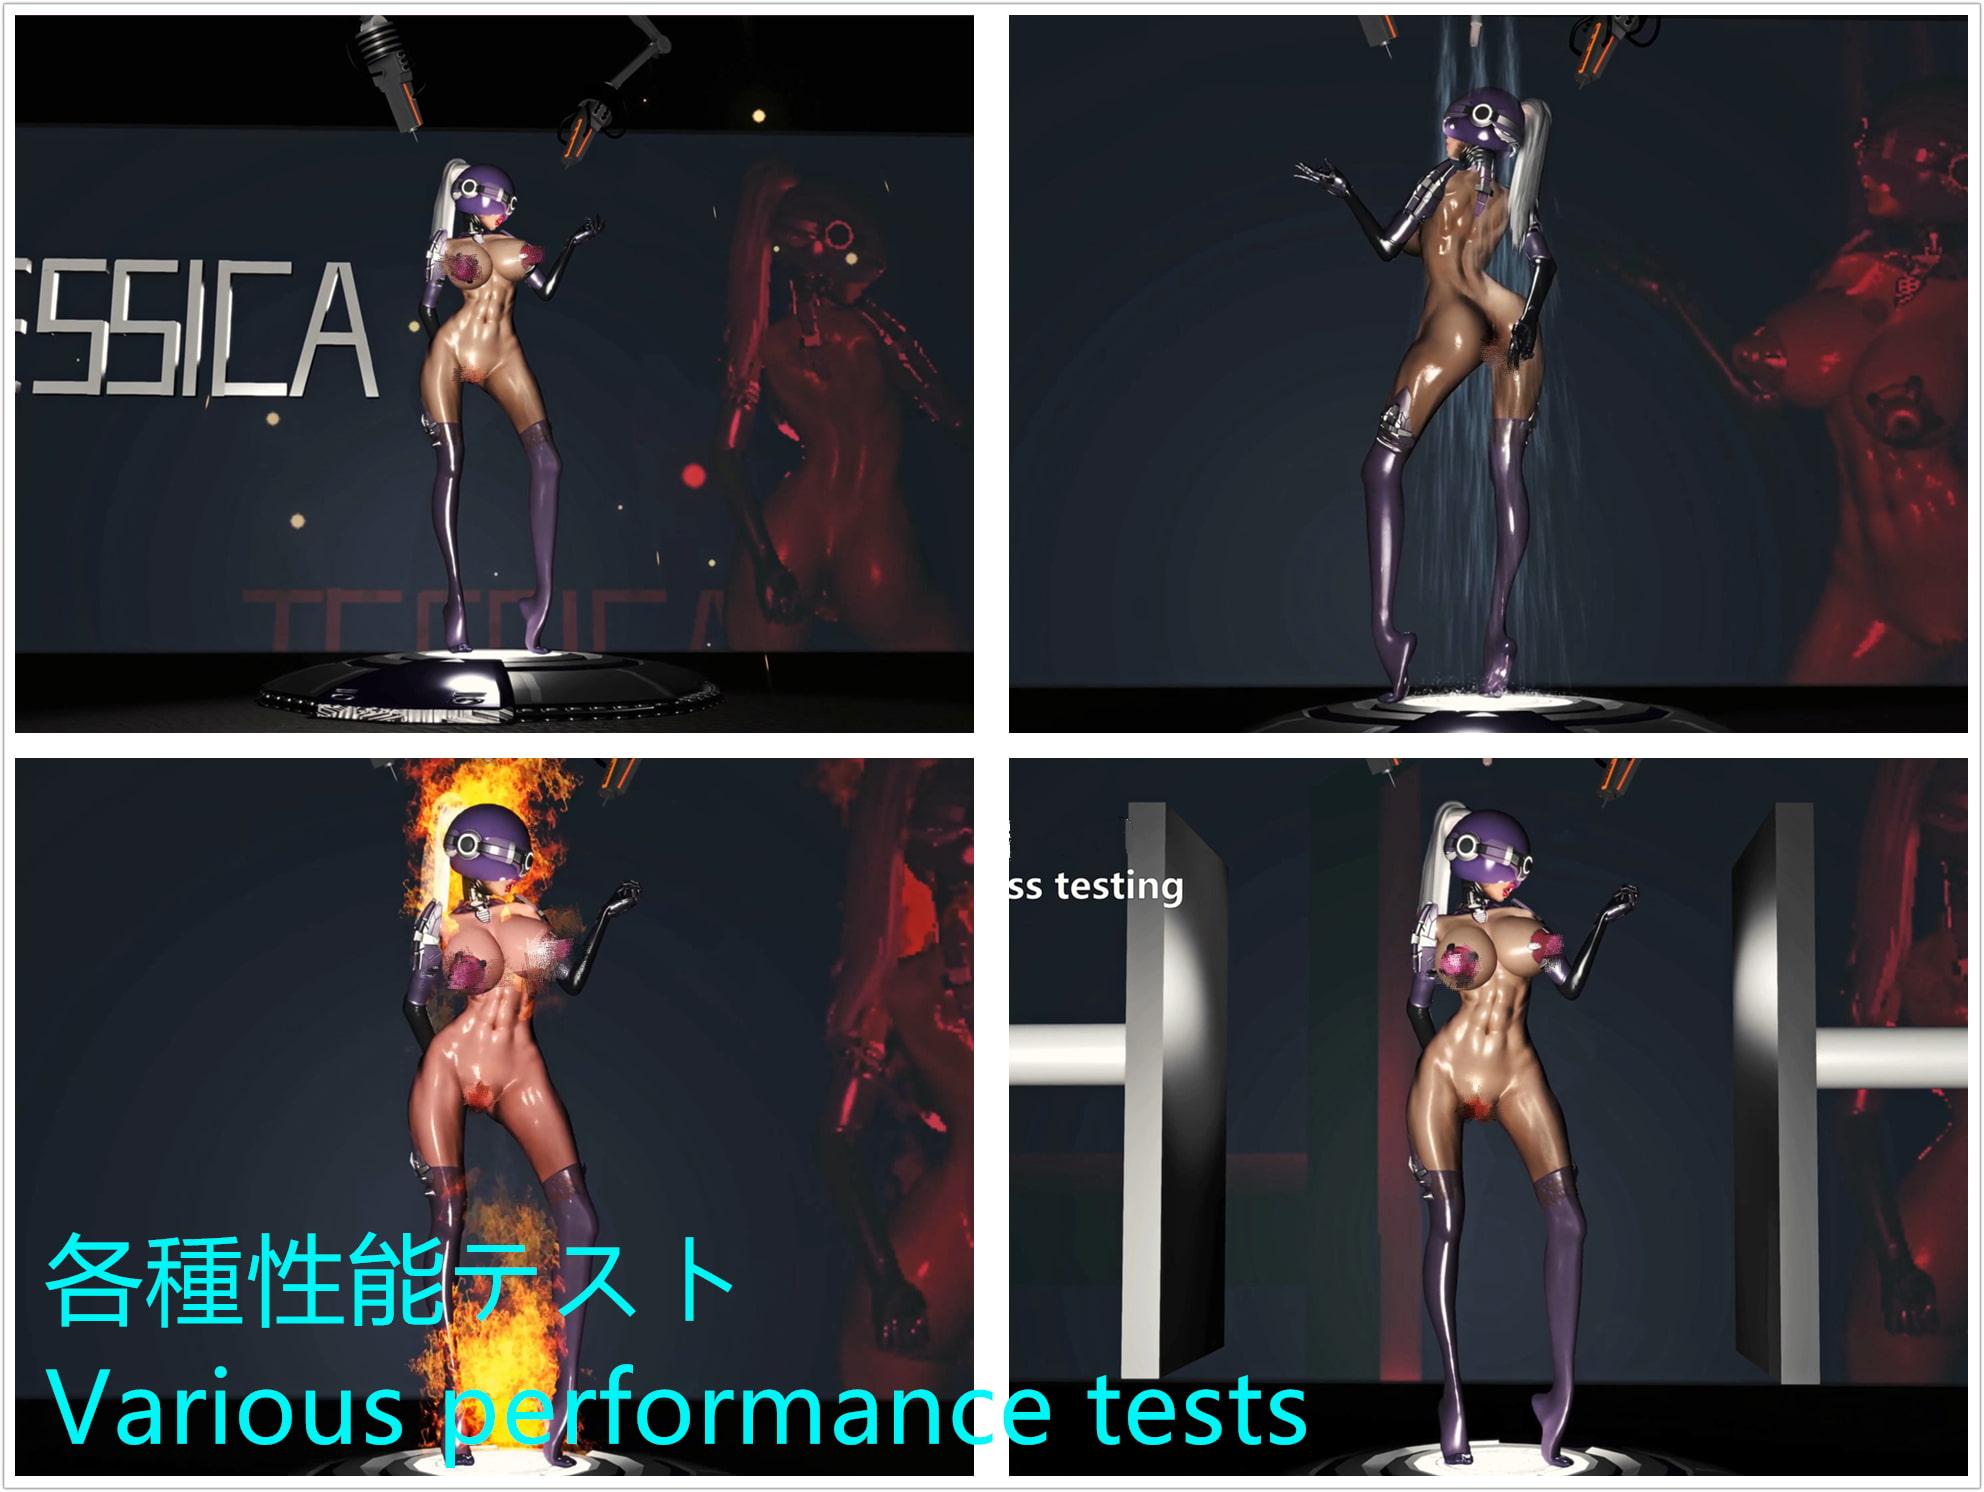 Jessica(The Arena) 3Dアニメーションシリーズ